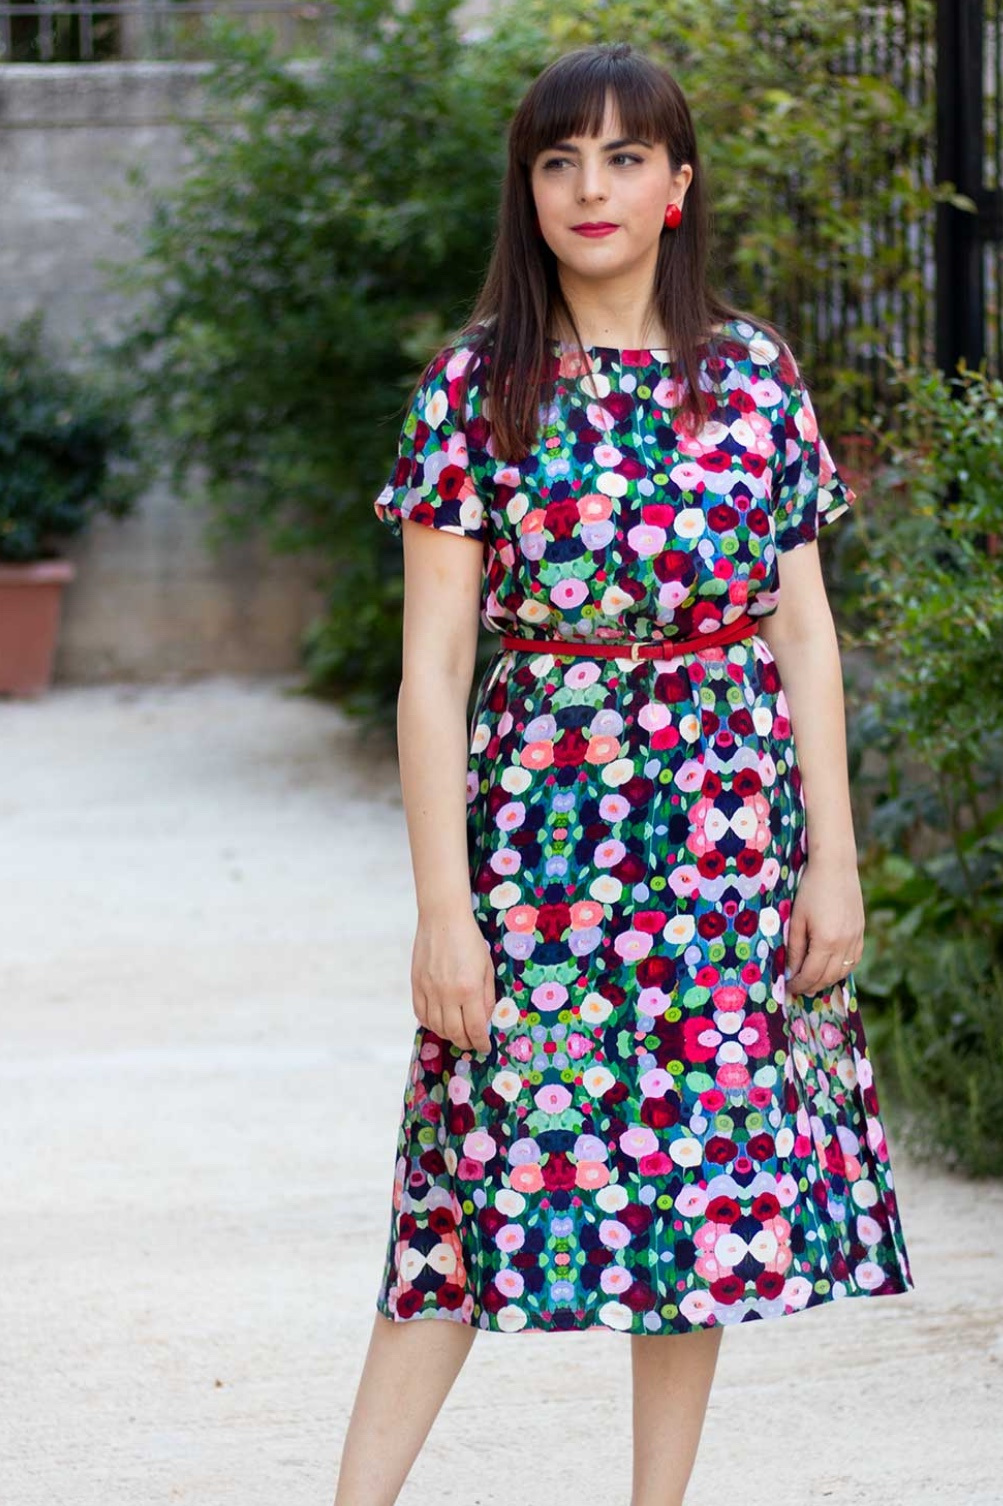 Meg Dress and Top from Athina Kakou